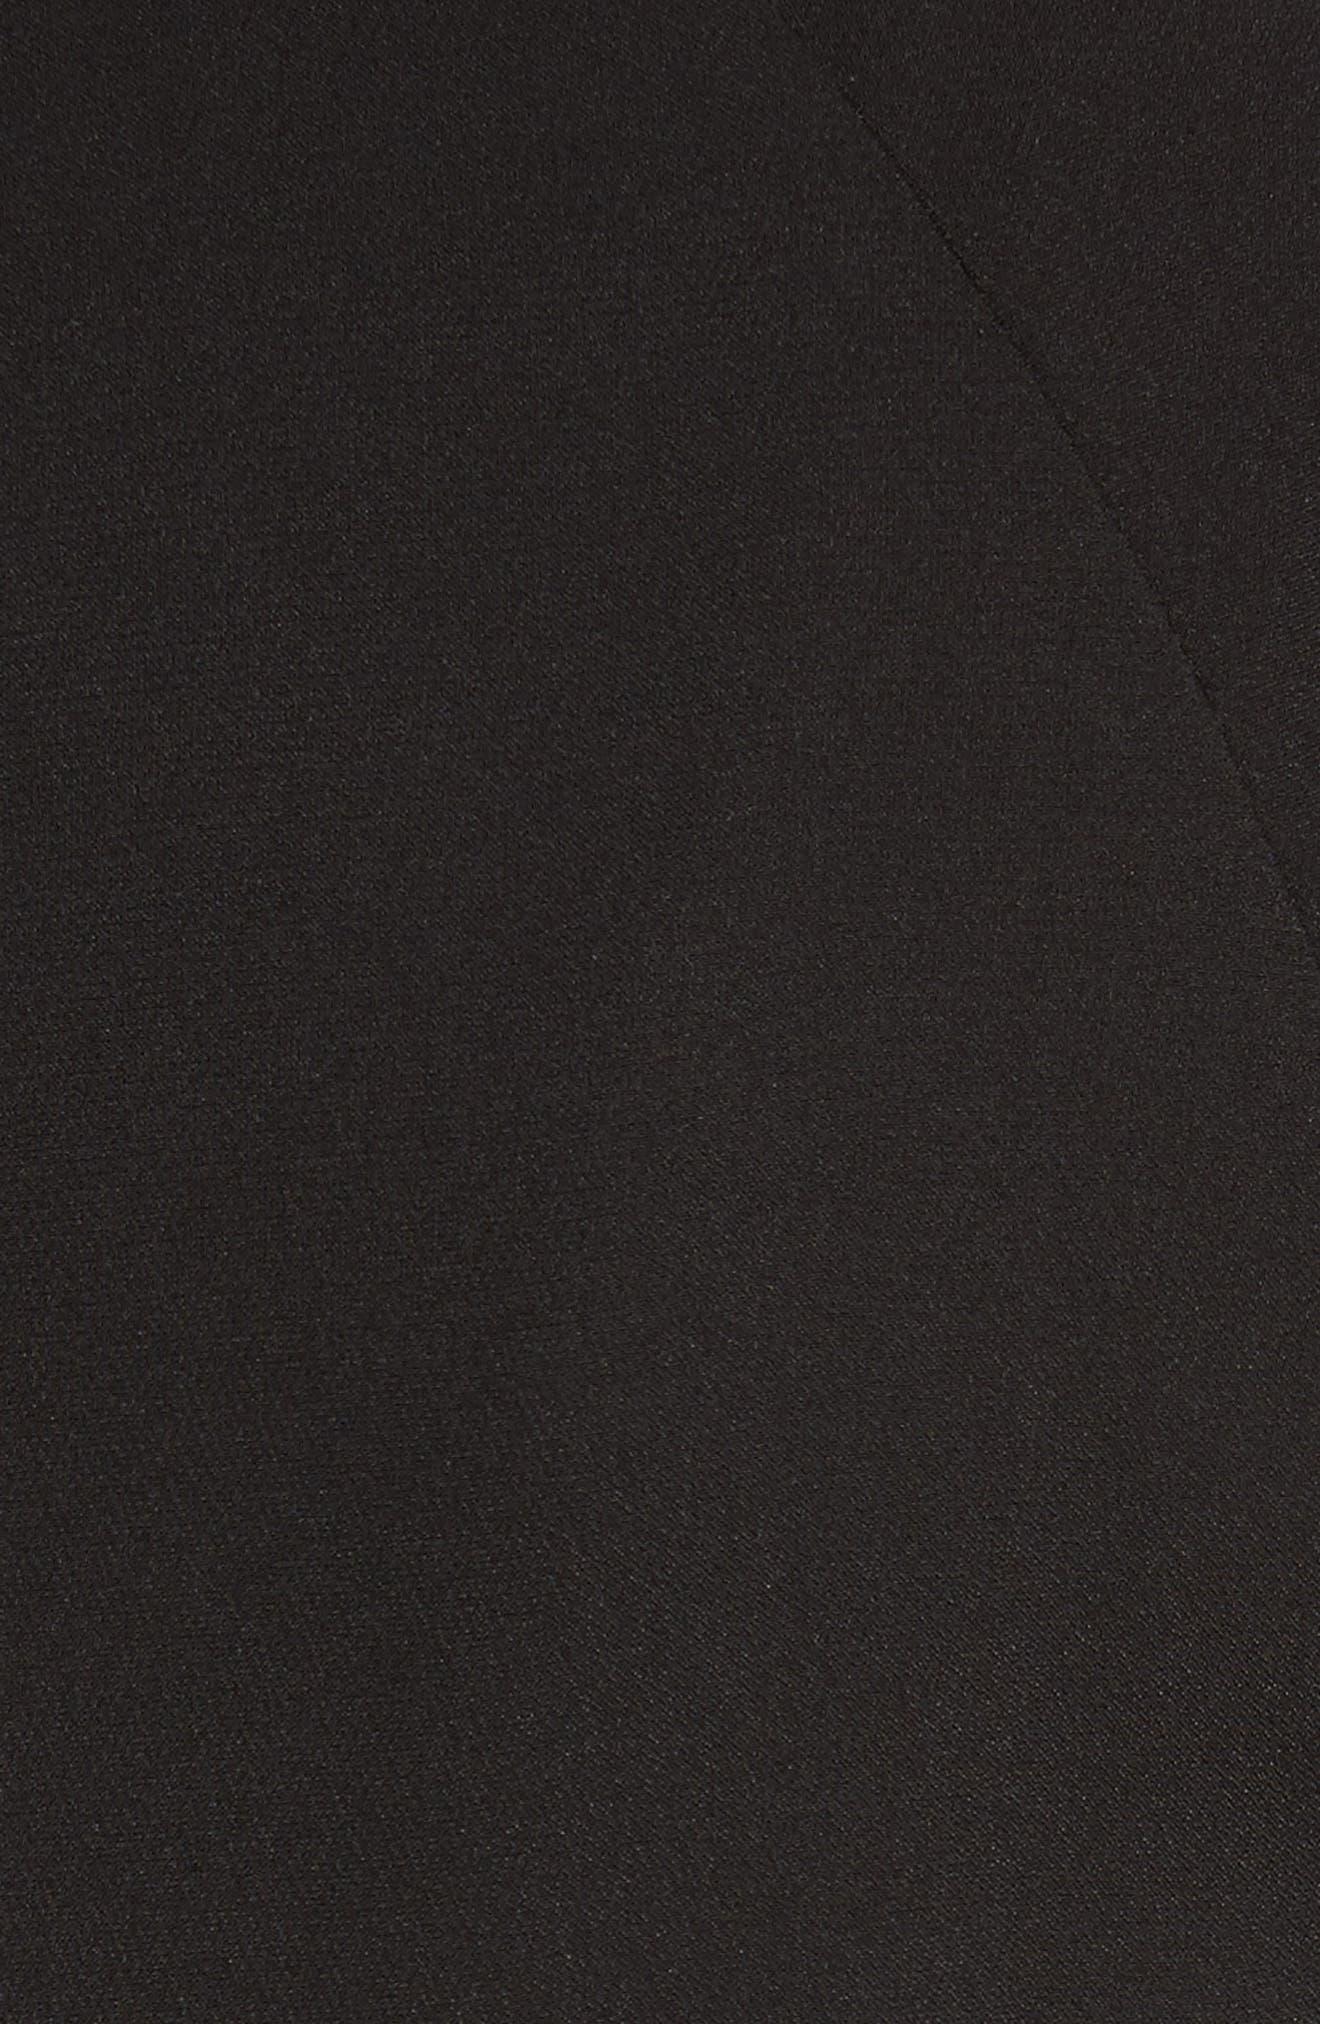 Rauma Silk Dress,                             Alternate thumbnail 6, color,                             Black/ Silver/ Sand/ Ivory